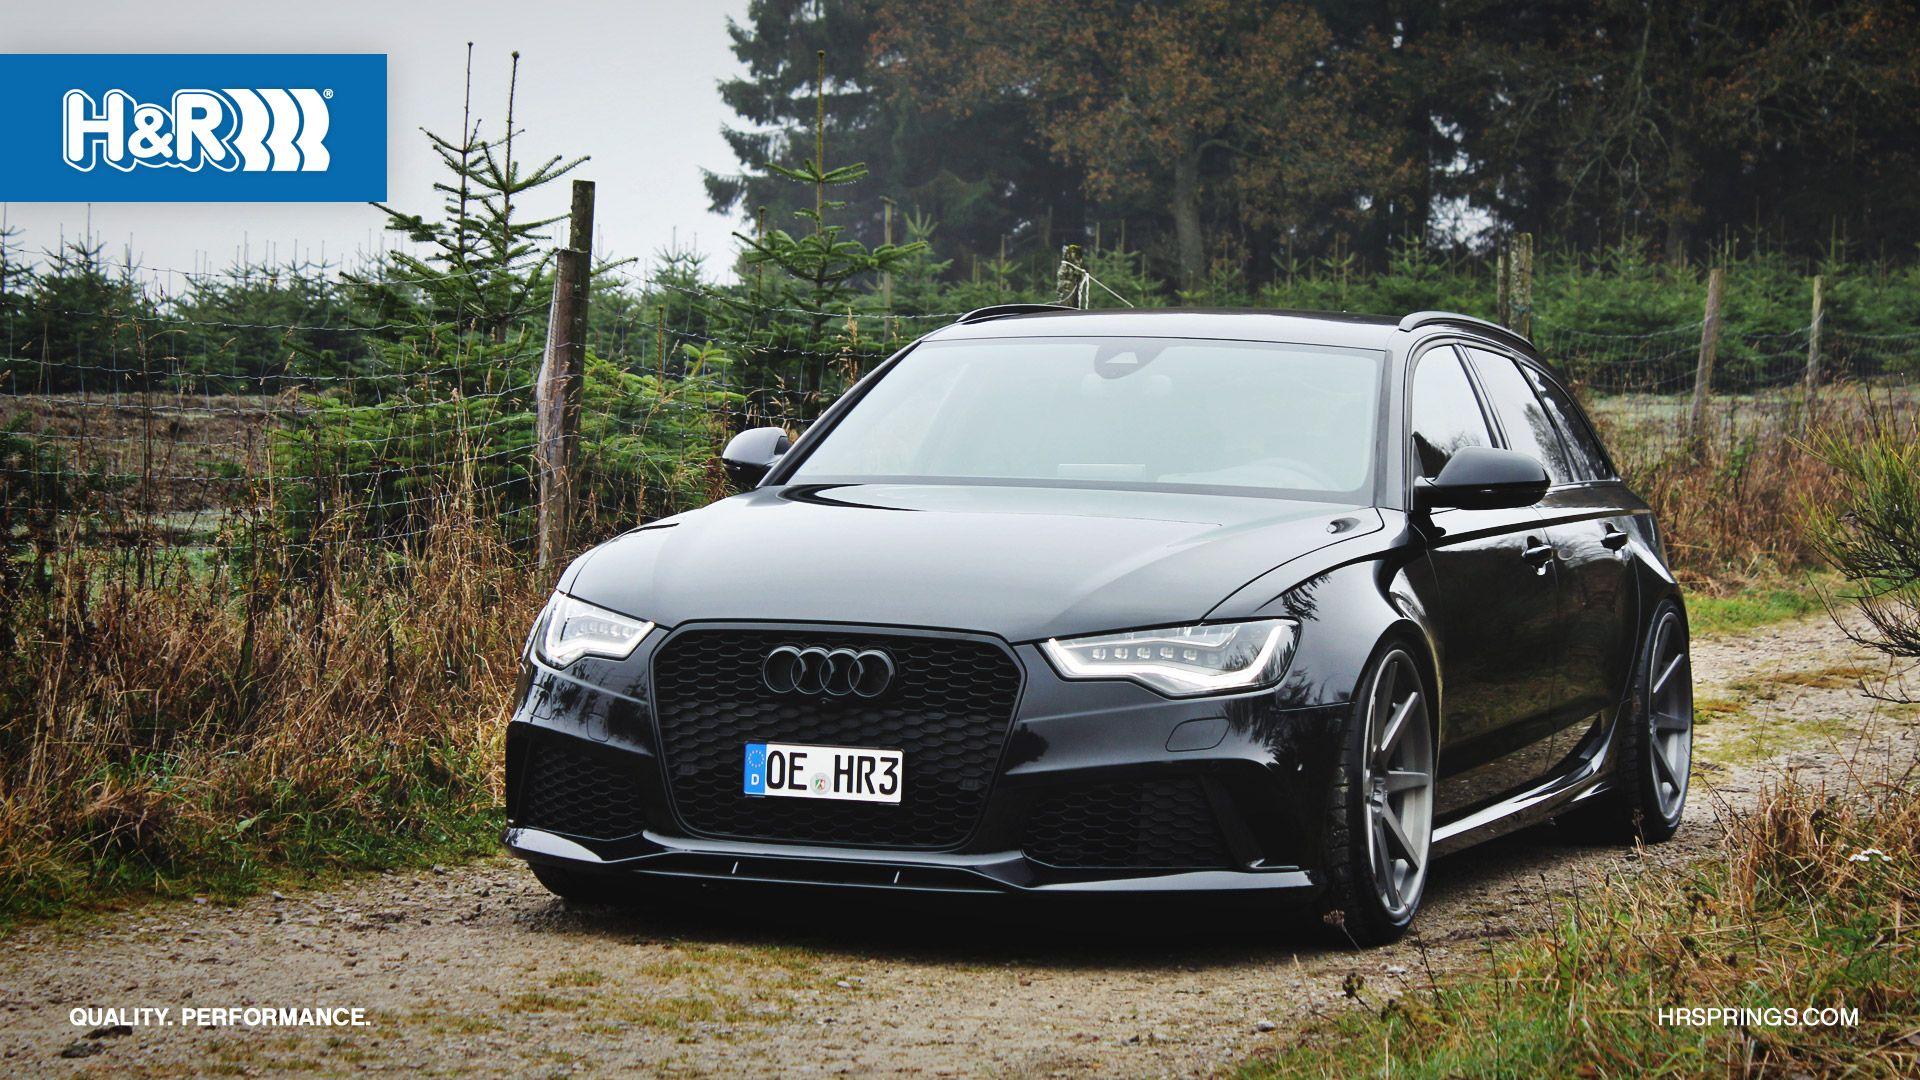 Audi Rs6 Avant Wallpaper Hd - Google Search